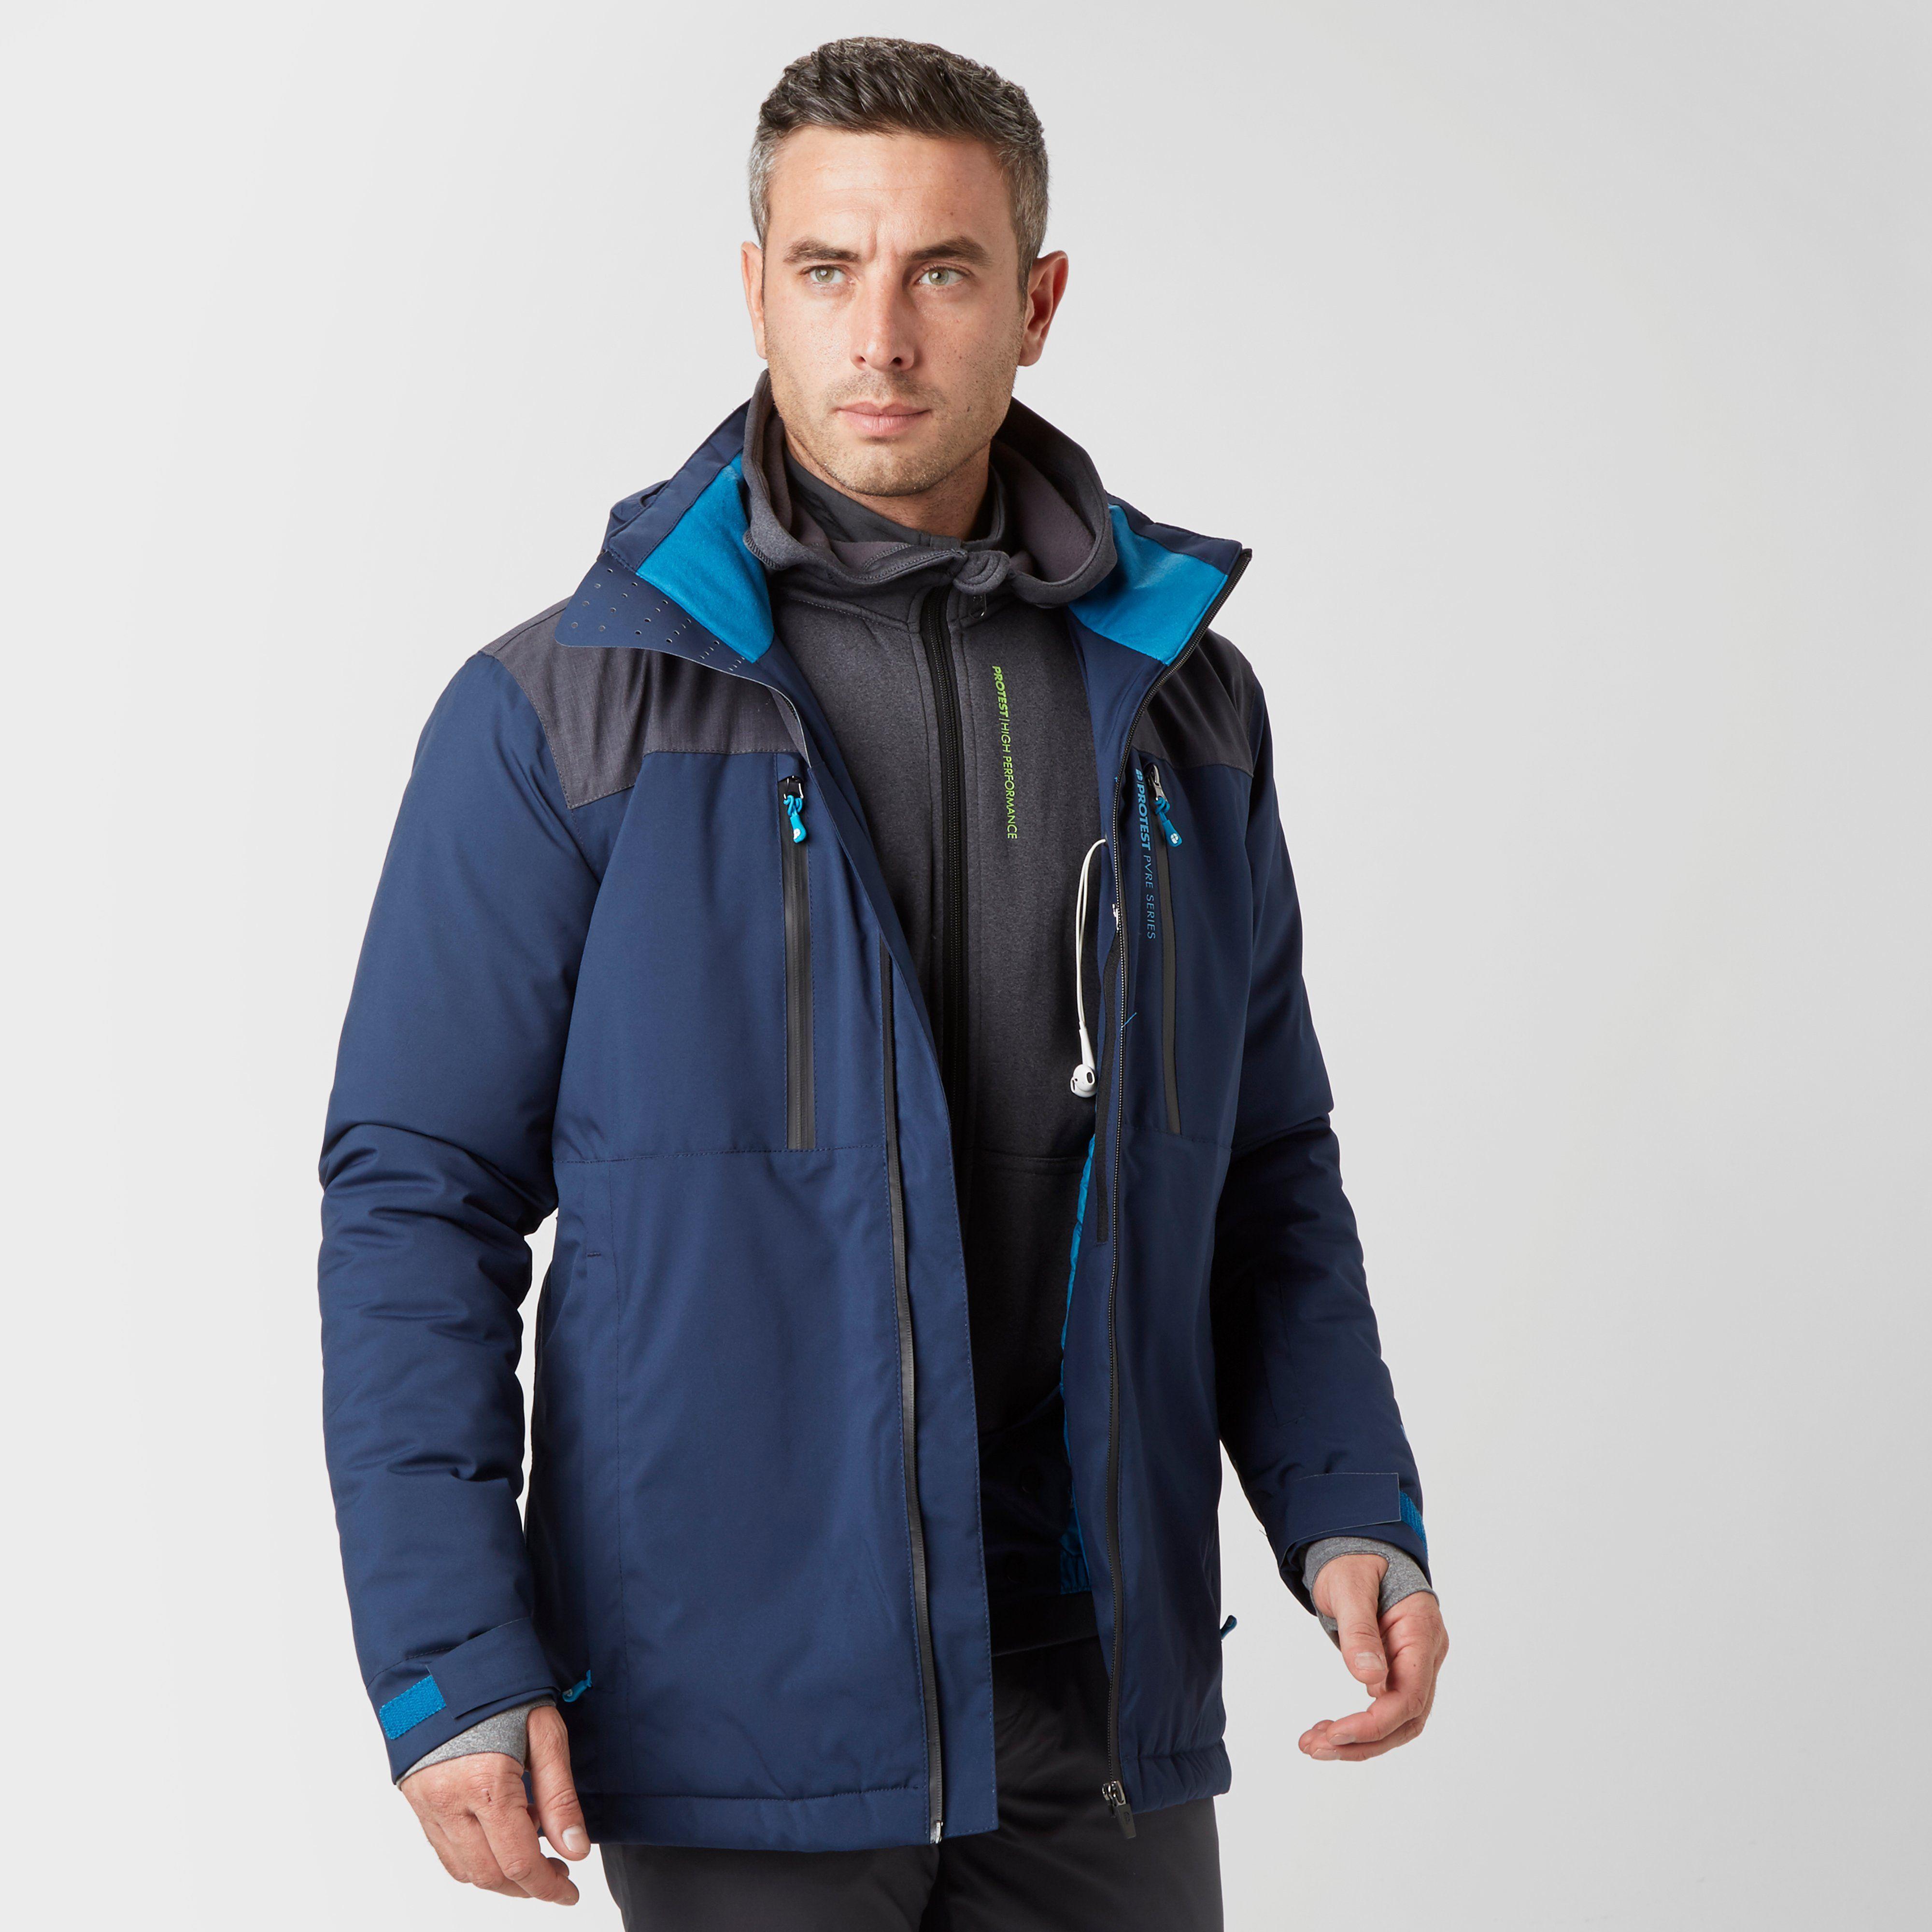 PROTEST Men's Clue Ski Jacket